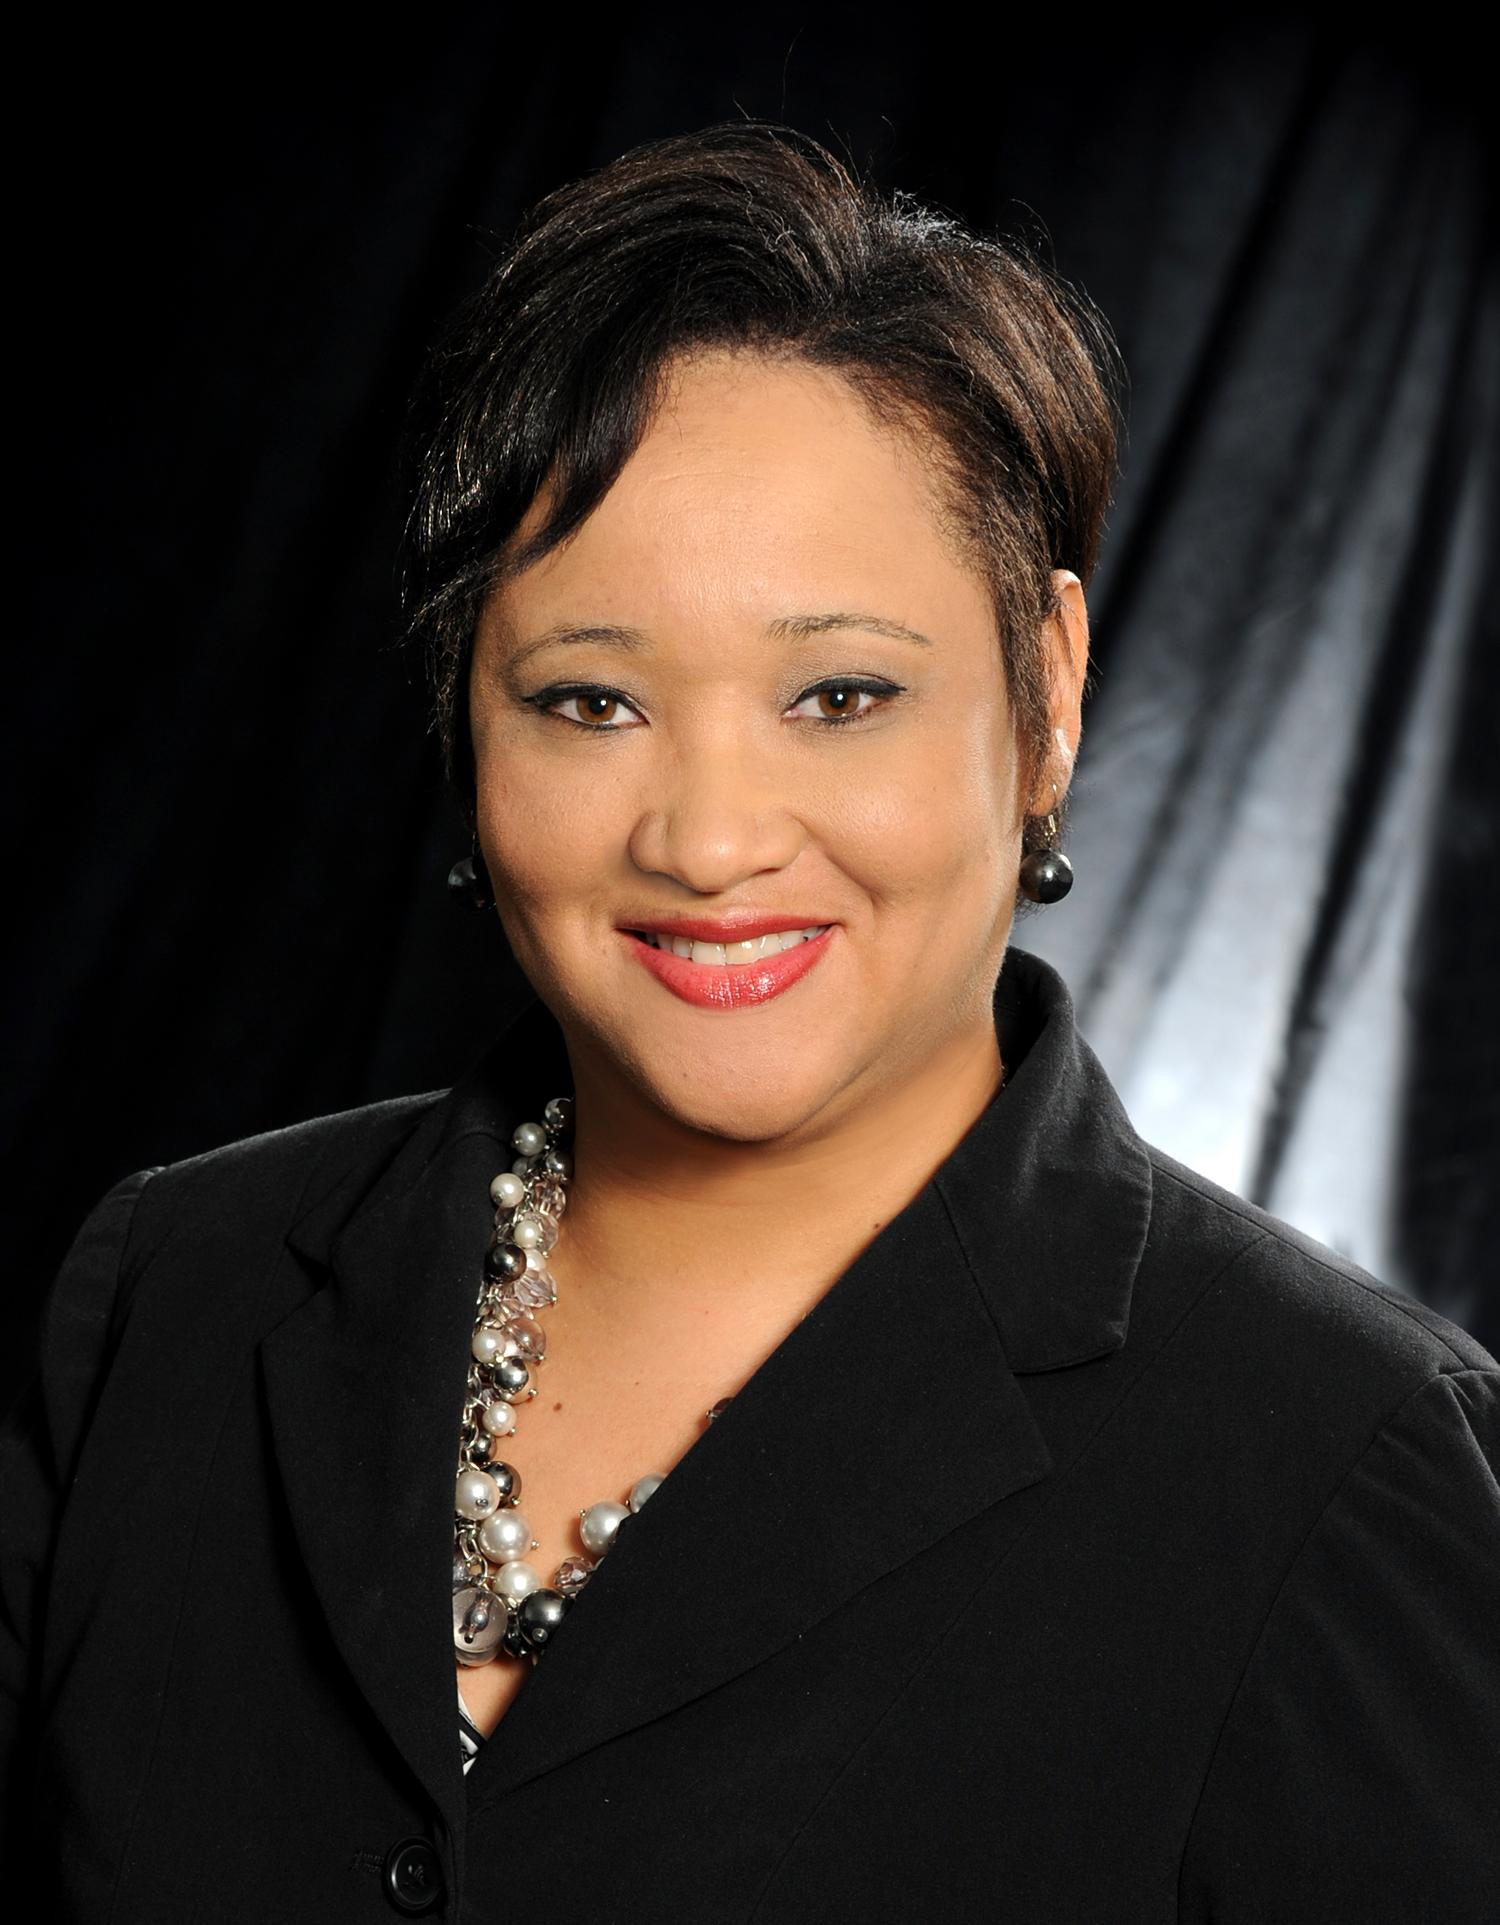 Mrs. Judiann Myles, Deputy Head of Compliance Division